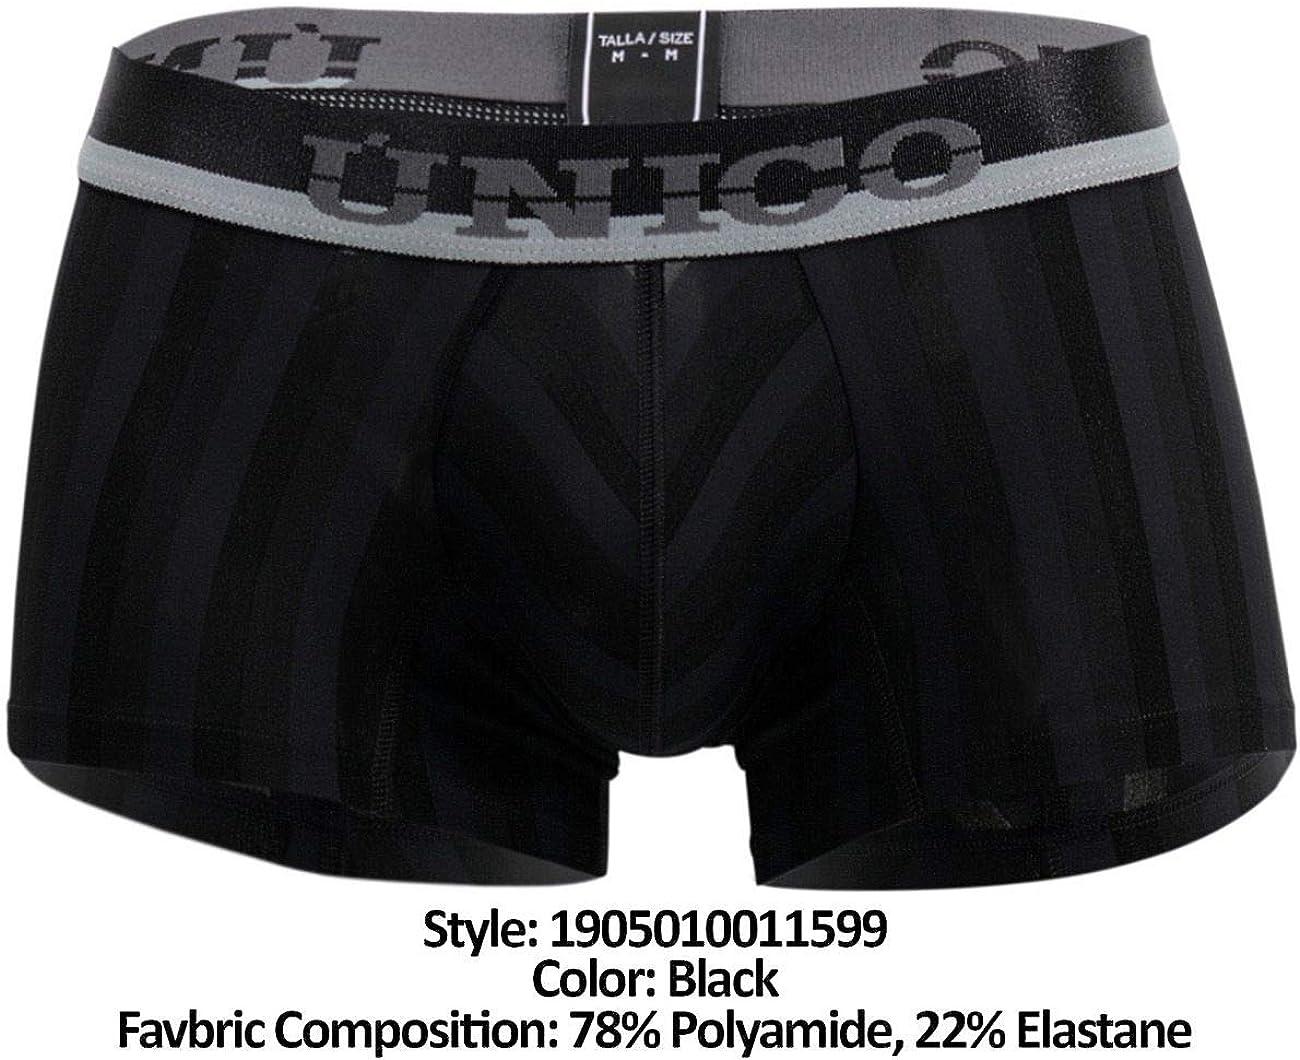 Mundo Unico Men Underwear Microfiber Medium Boxer Briefs Jaquard Calzoncillos